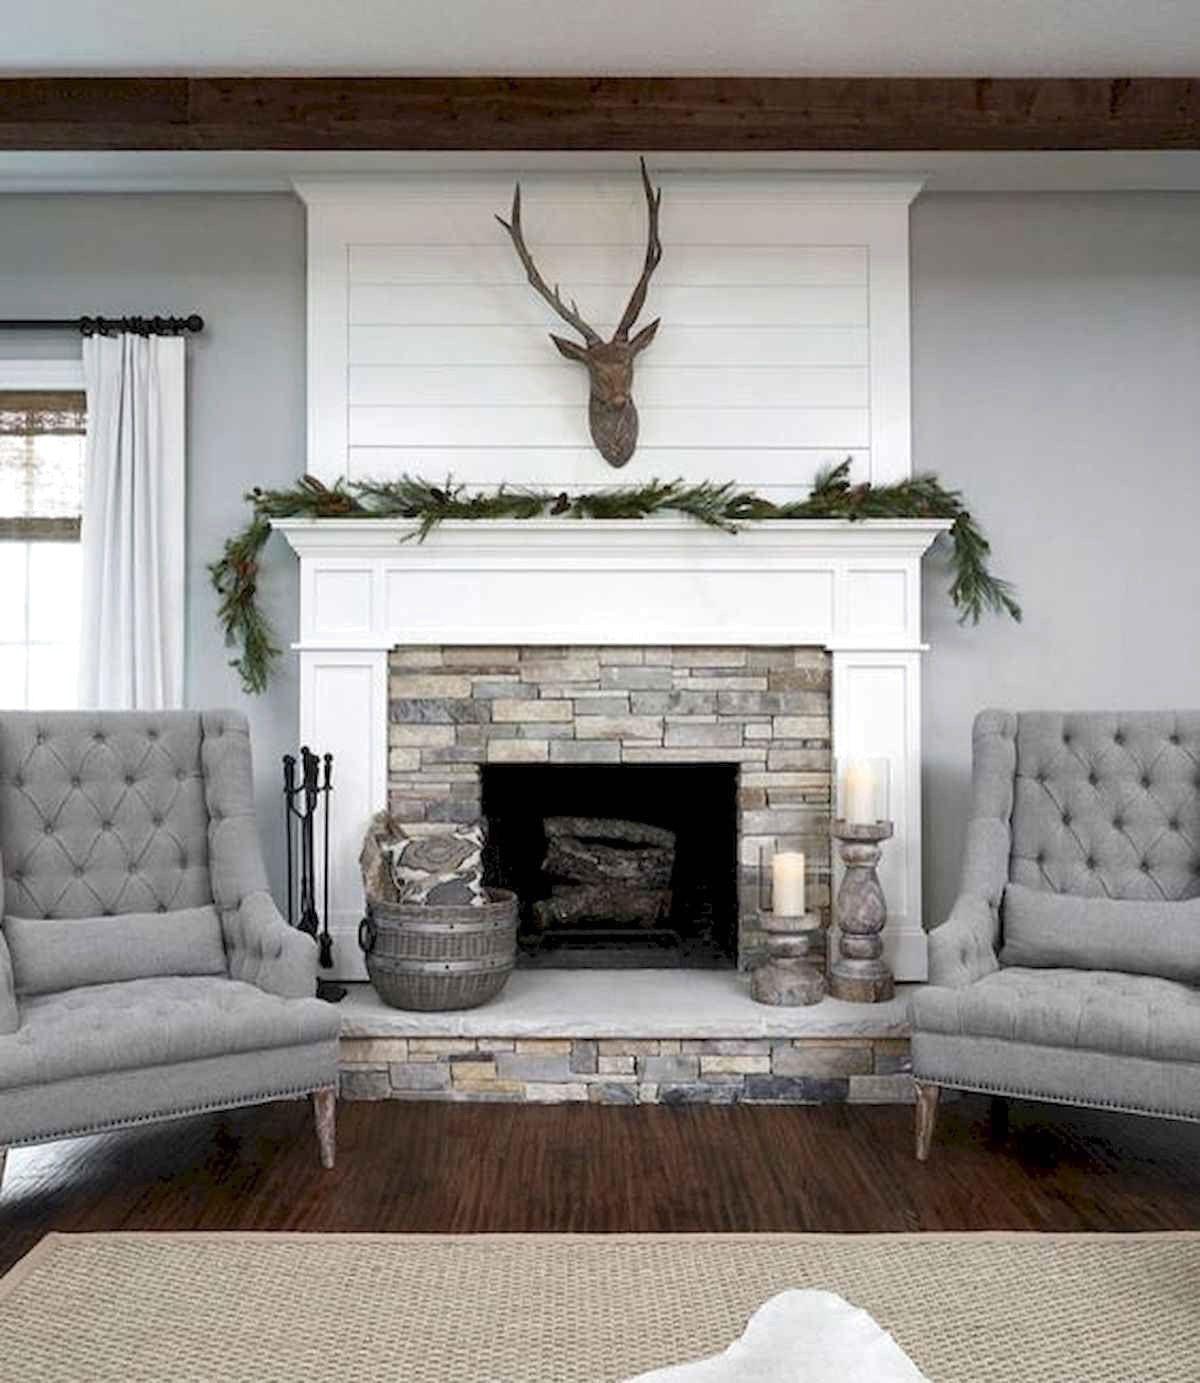 Best Modern Farmhouse Fireplace Mantel Decor Ideas Frugal Living Farmhouse Fireplace Decor Farm House Living Room Fireplace Design